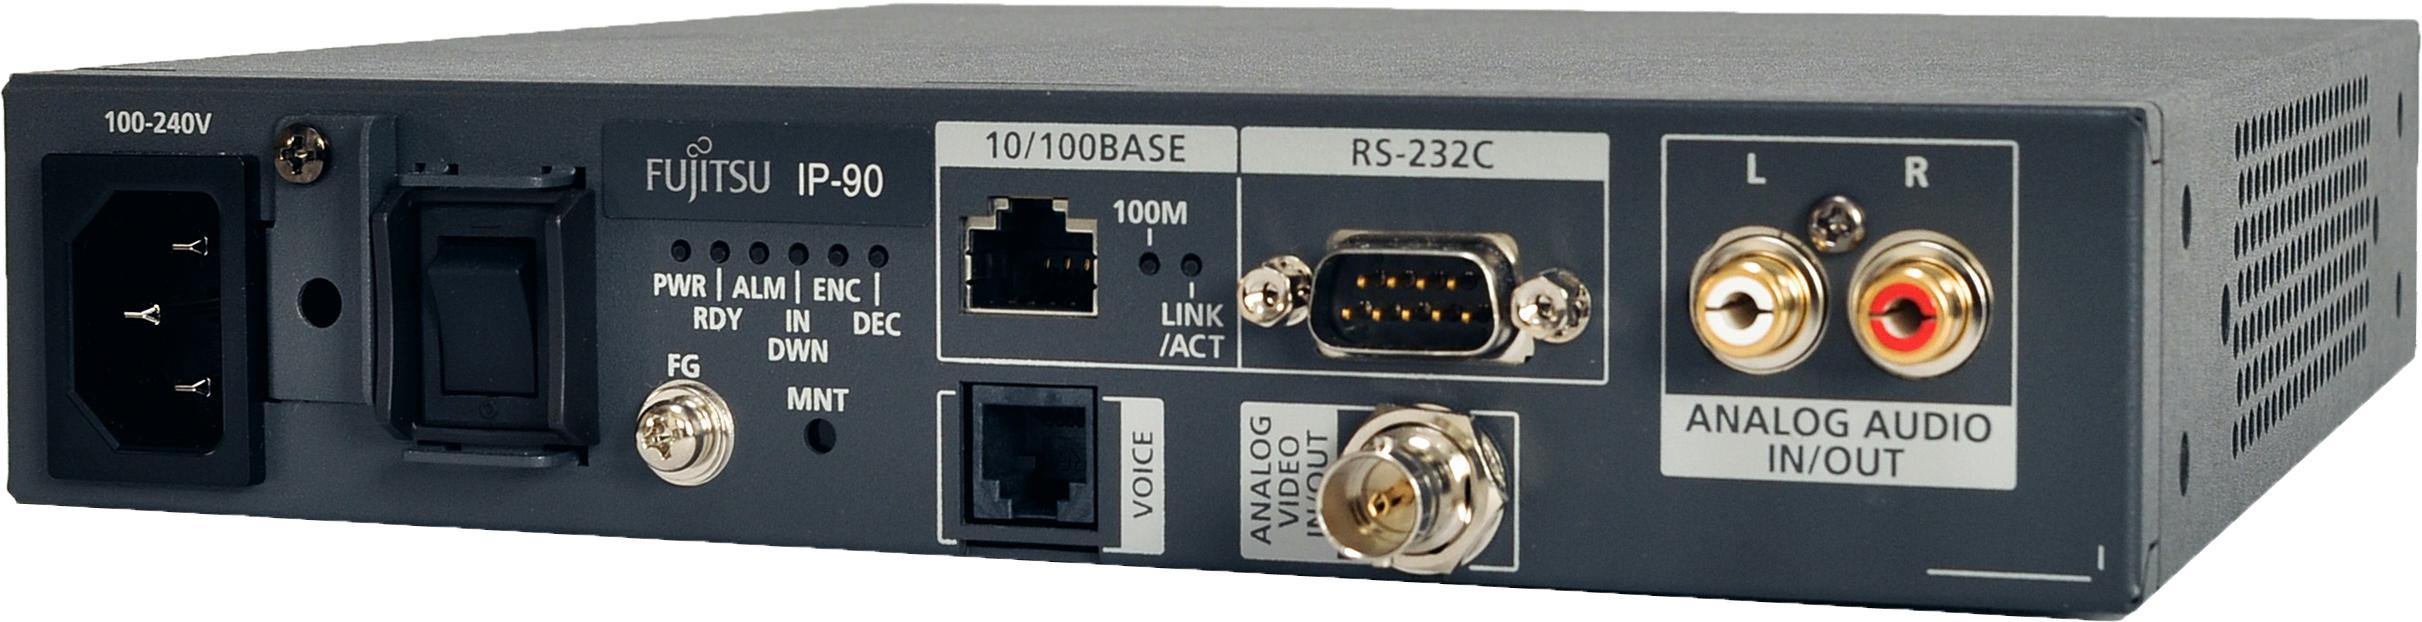 Ip 90 Compact Analog Sd Video Encoder Decoder Fujitsu Global Stereo Coder Multiplexer Larger View